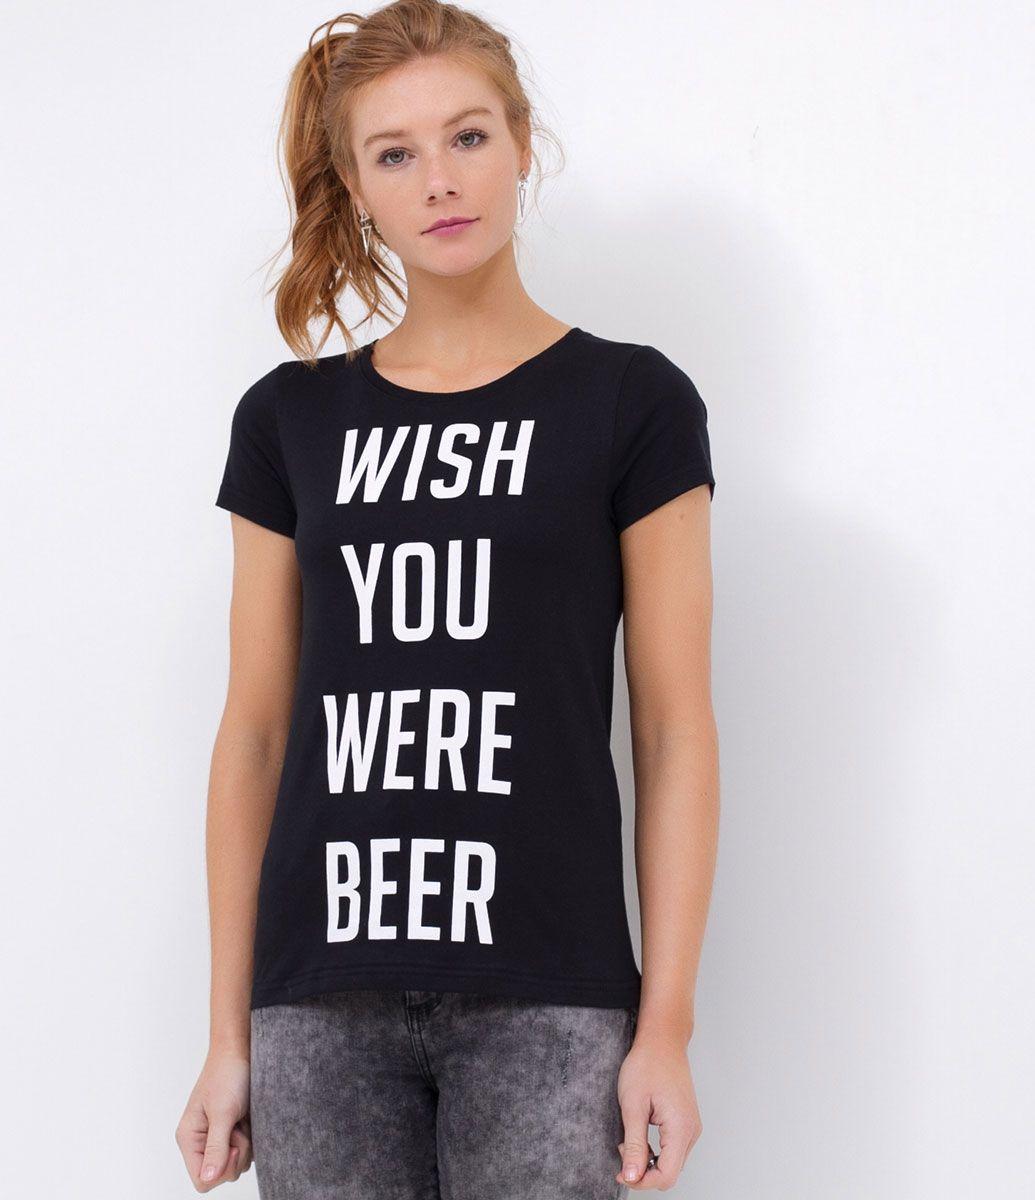 Camiseta preta com frase fun